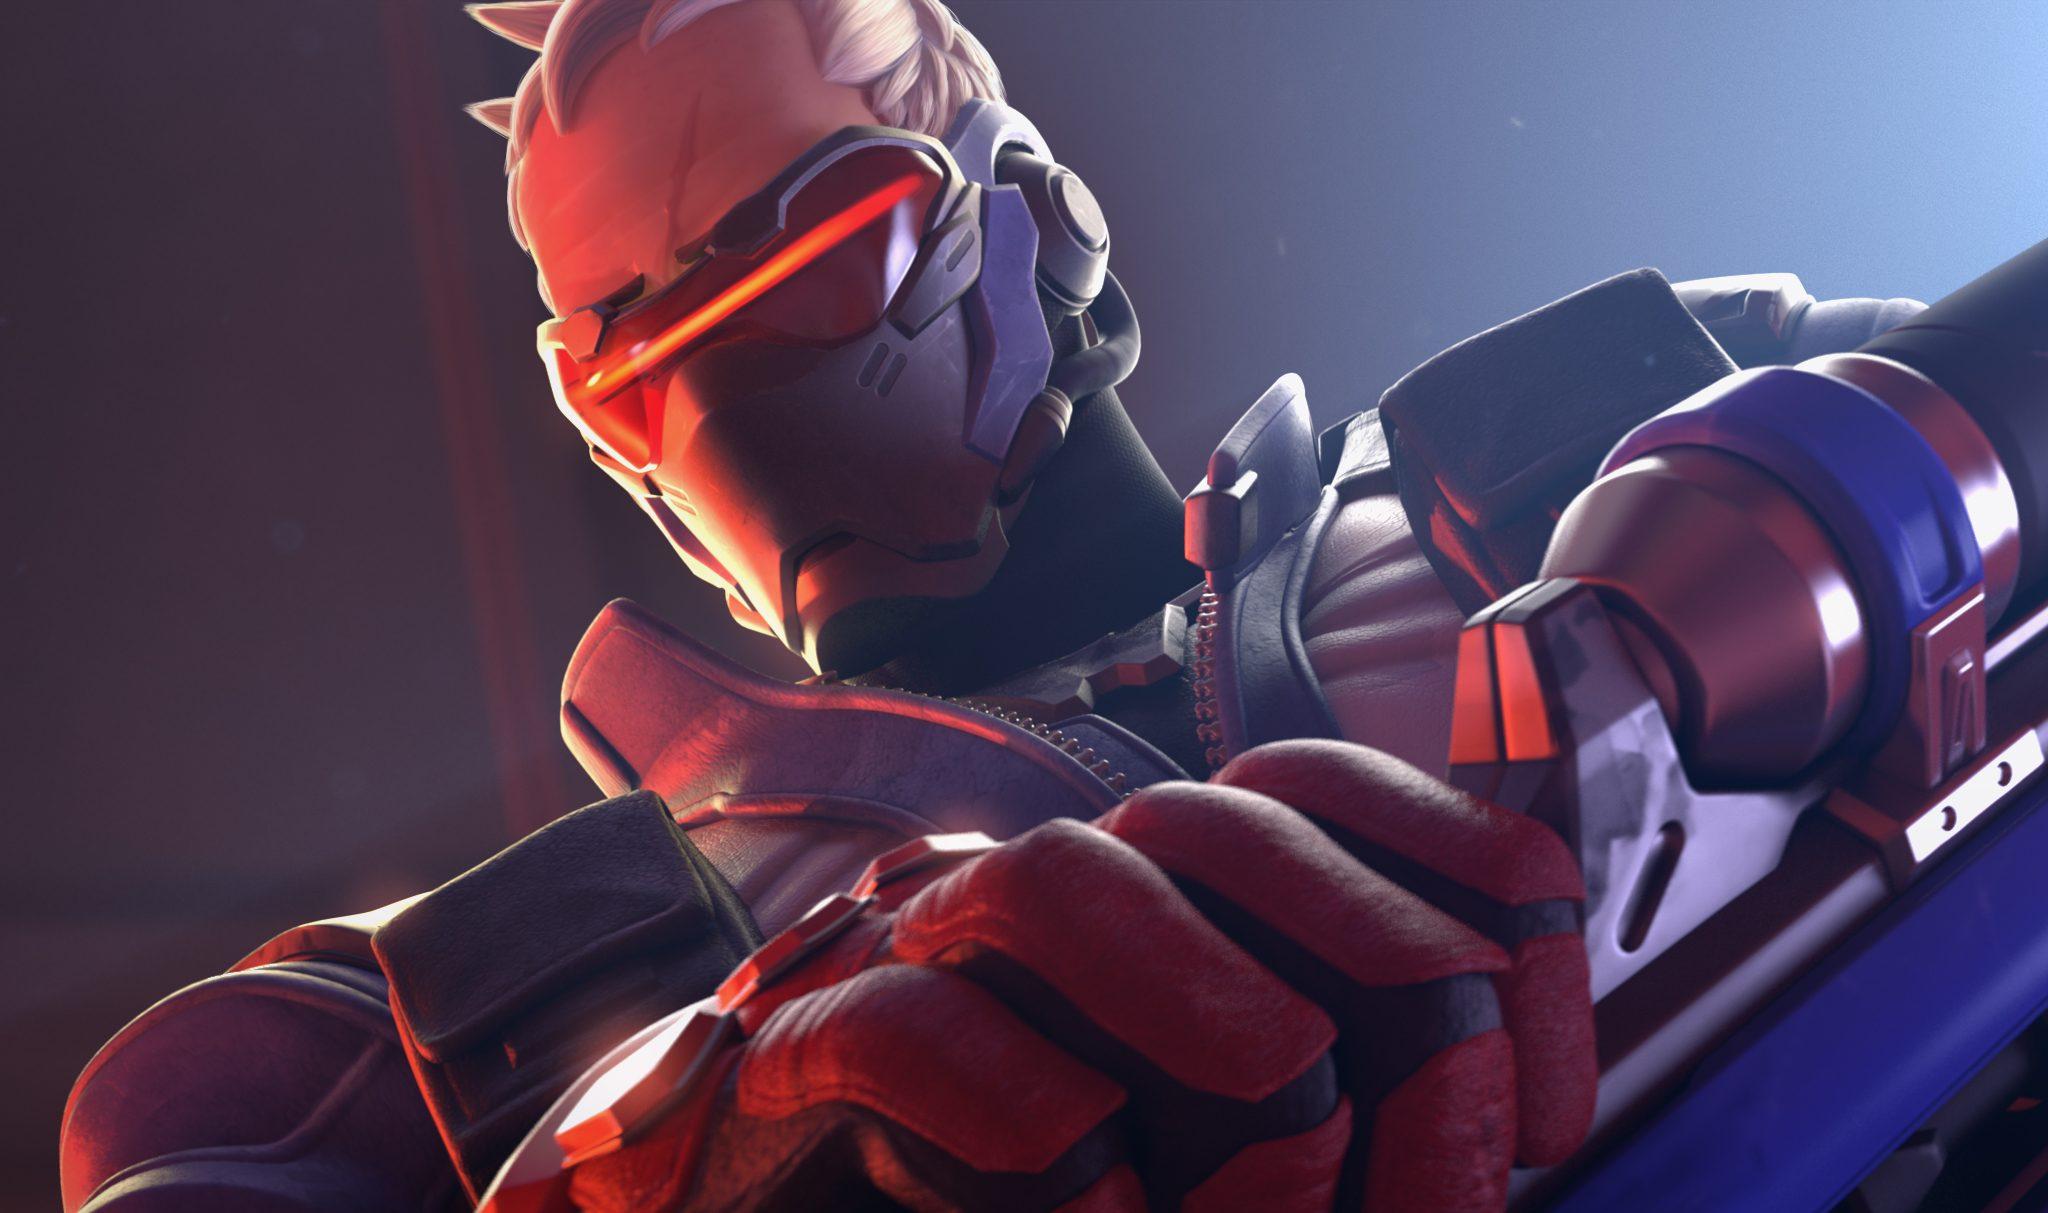 Overwatch Soldier76 Poster